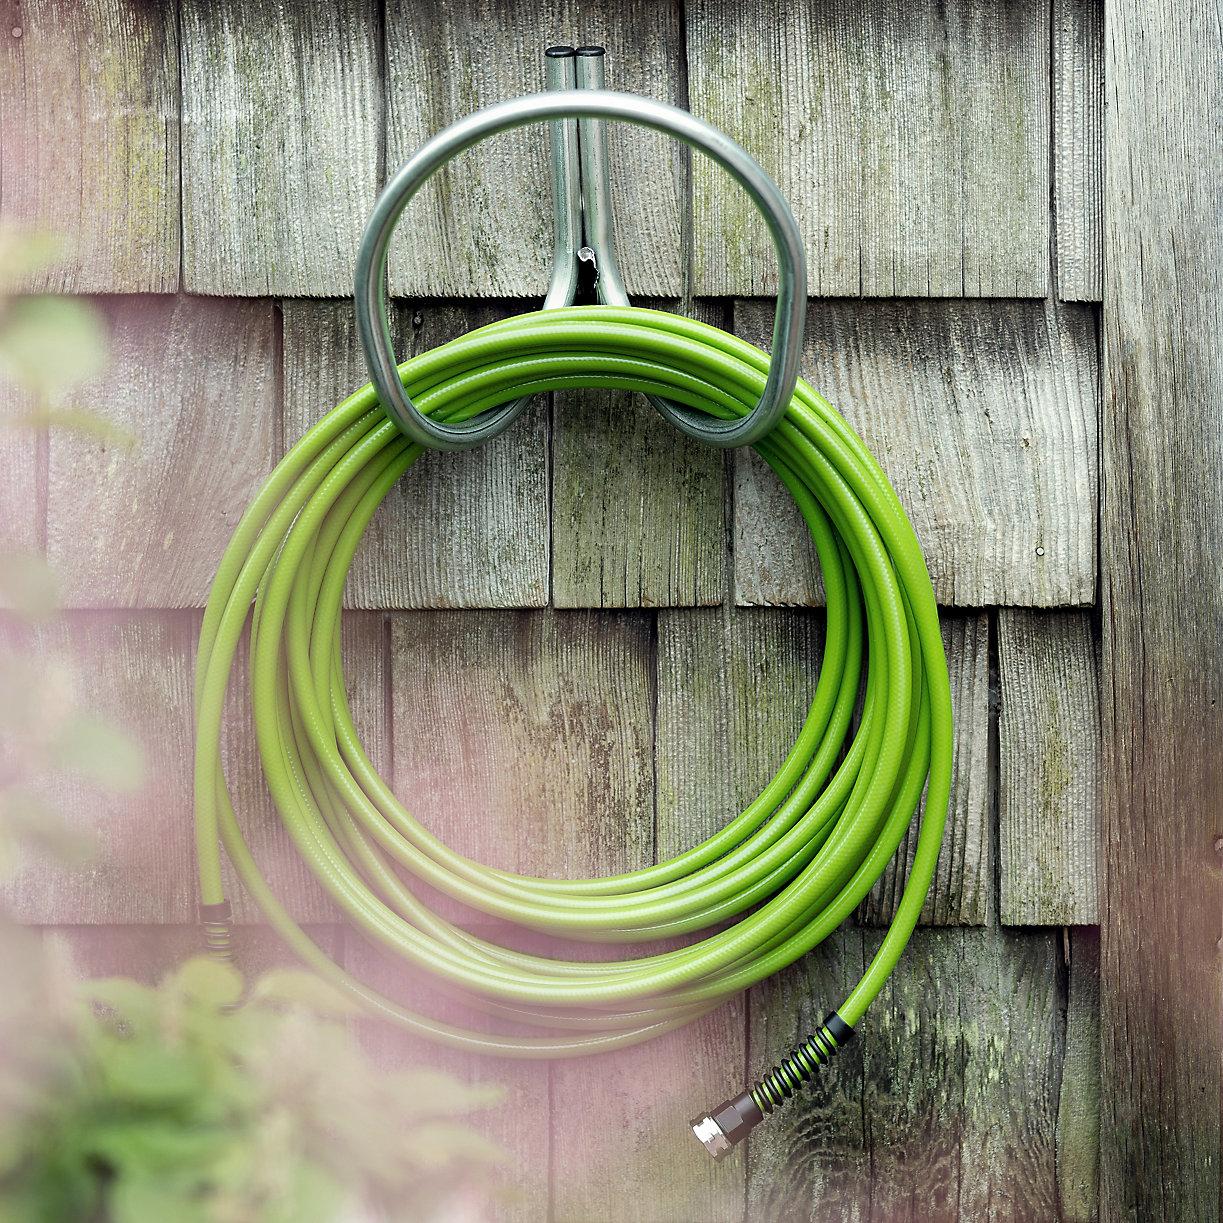 Hose Bracket Wall Mount Fresh useful Best Quality Garden Hose Holder,Metal